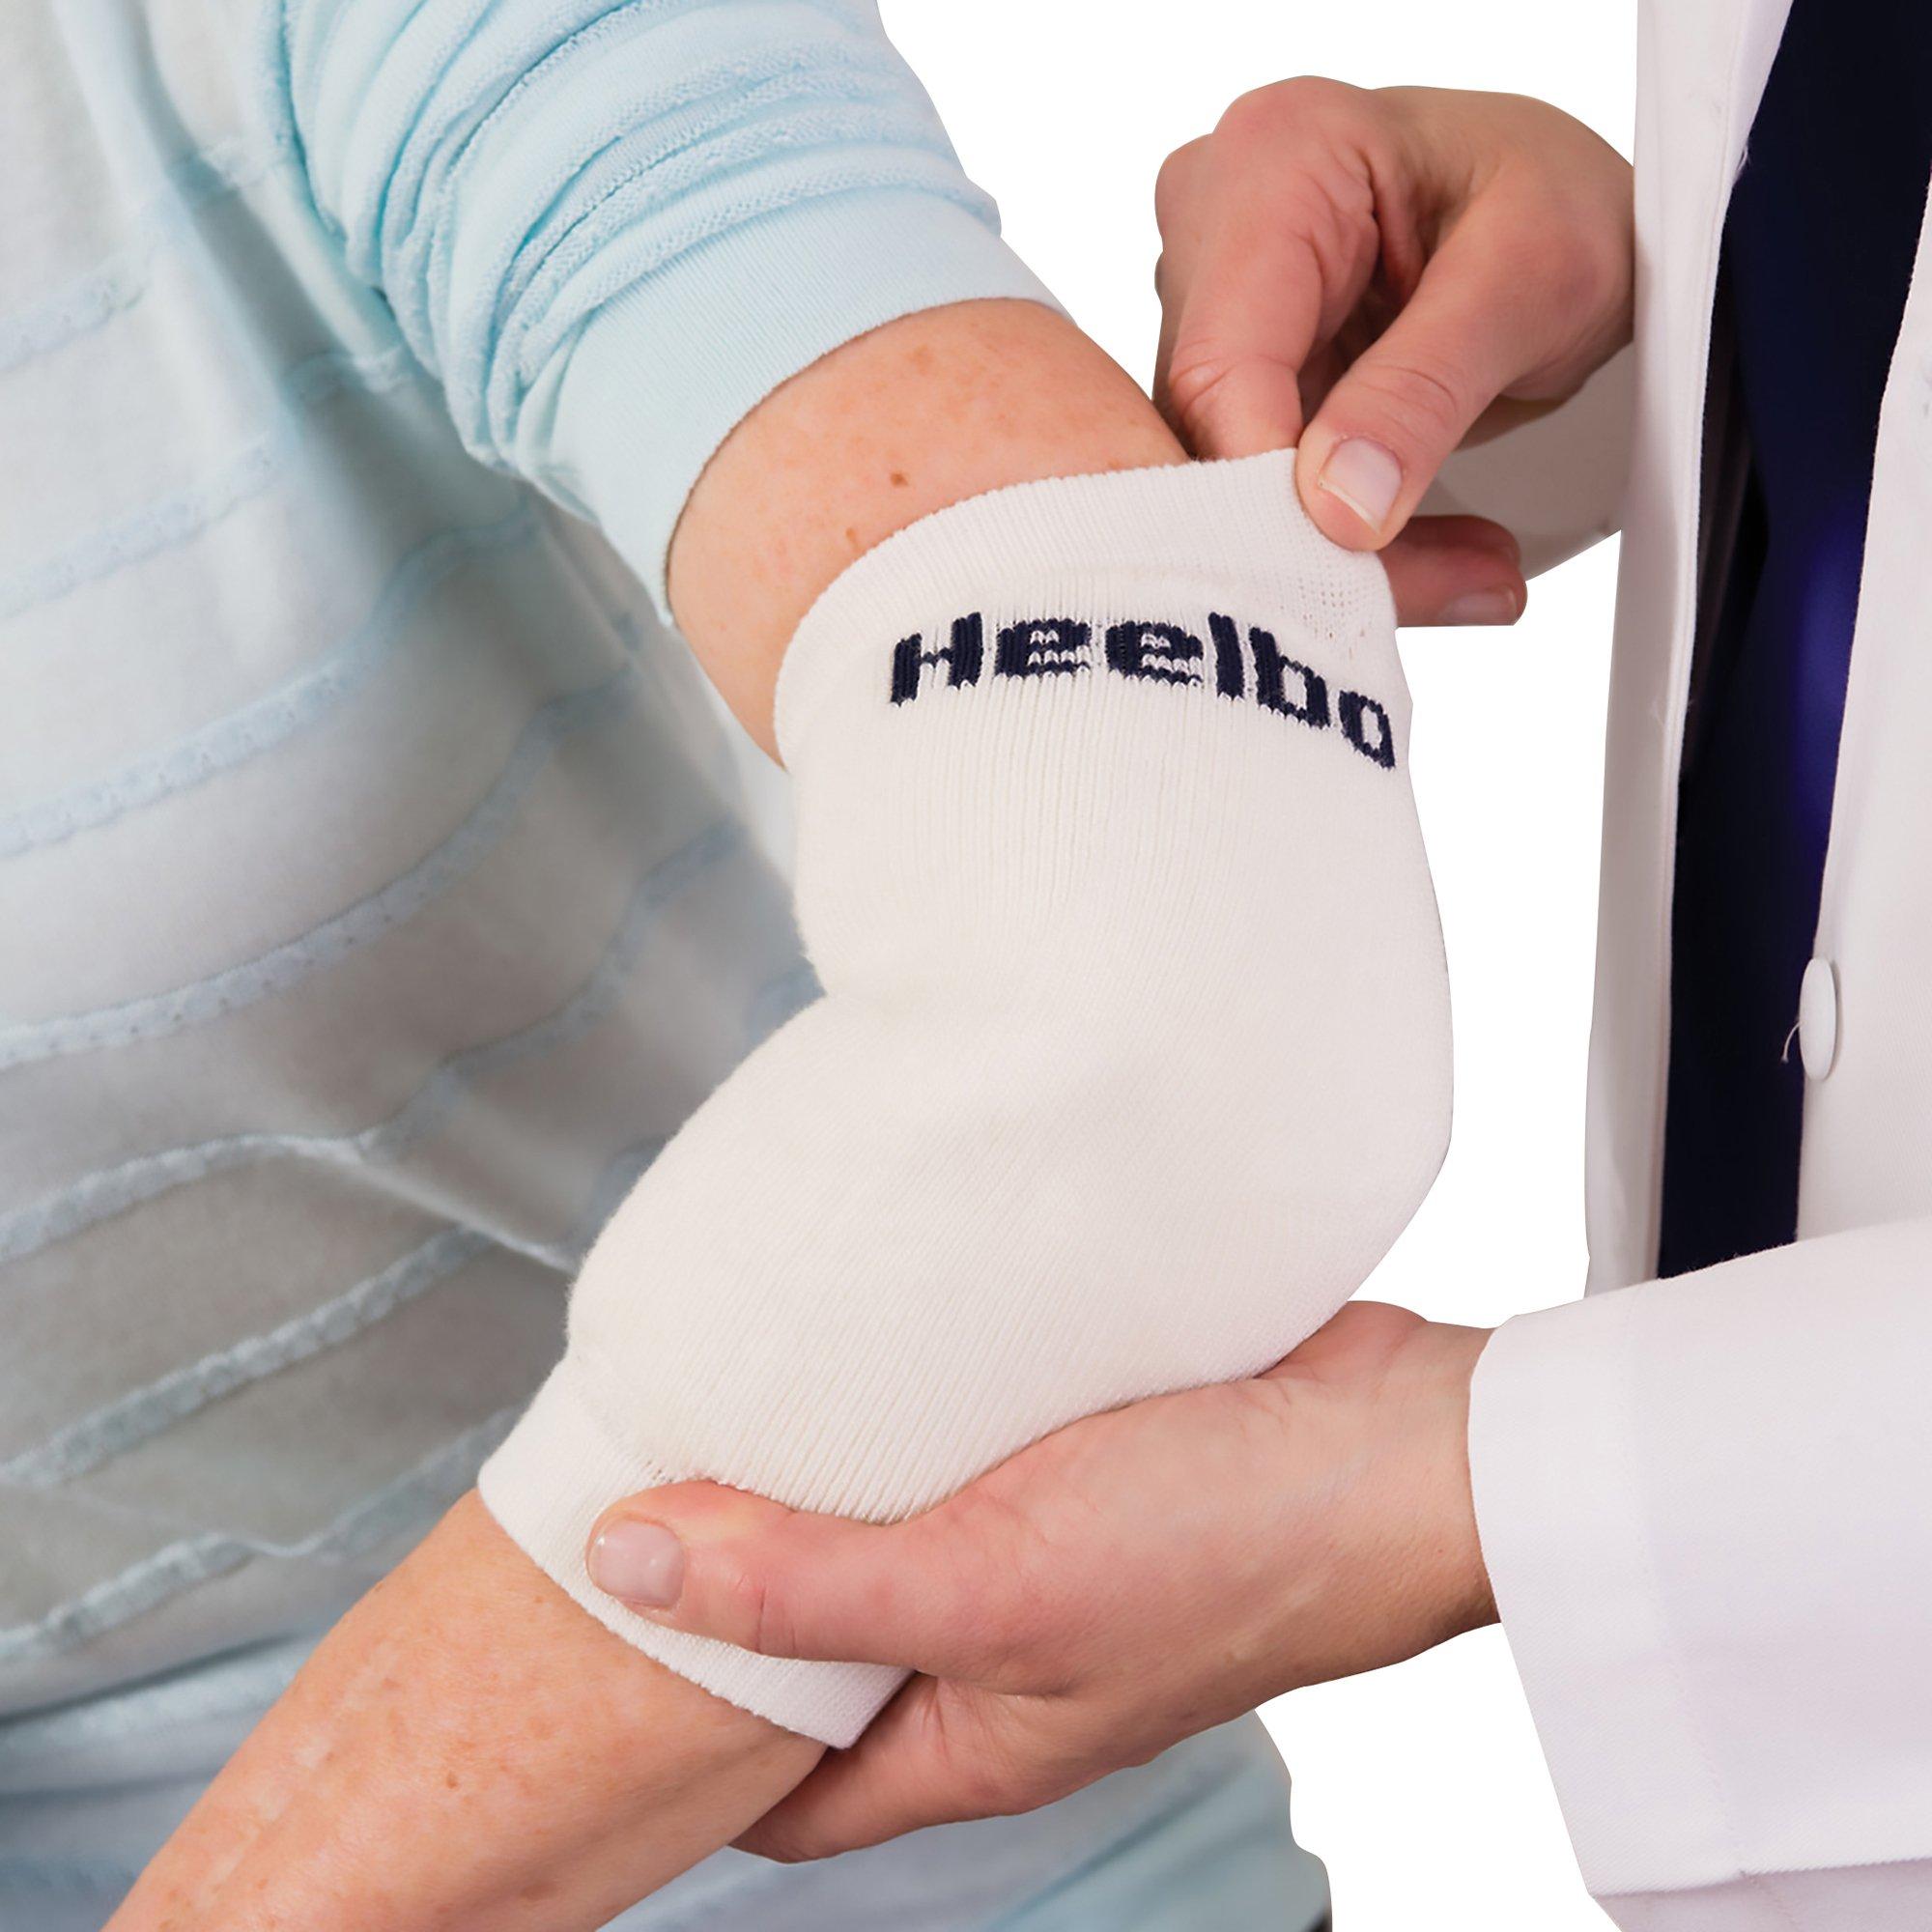 Heelbo Heel/Elbow Protection Sleeve , D 12039, White Large - 1 Each